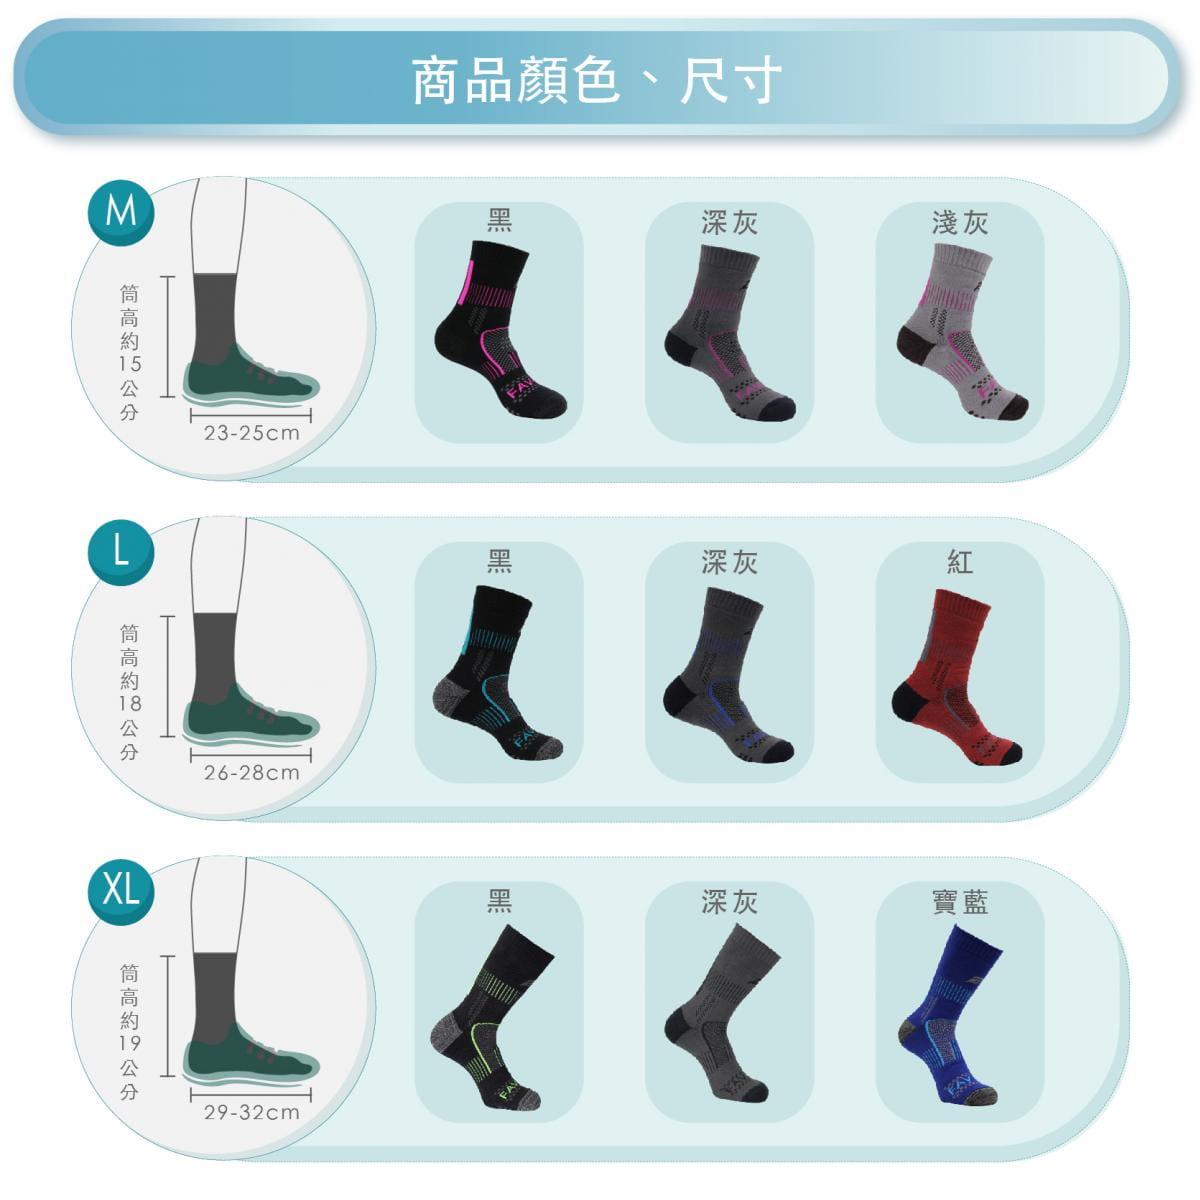 【FAV】止滑加厚保暖登山襪 6